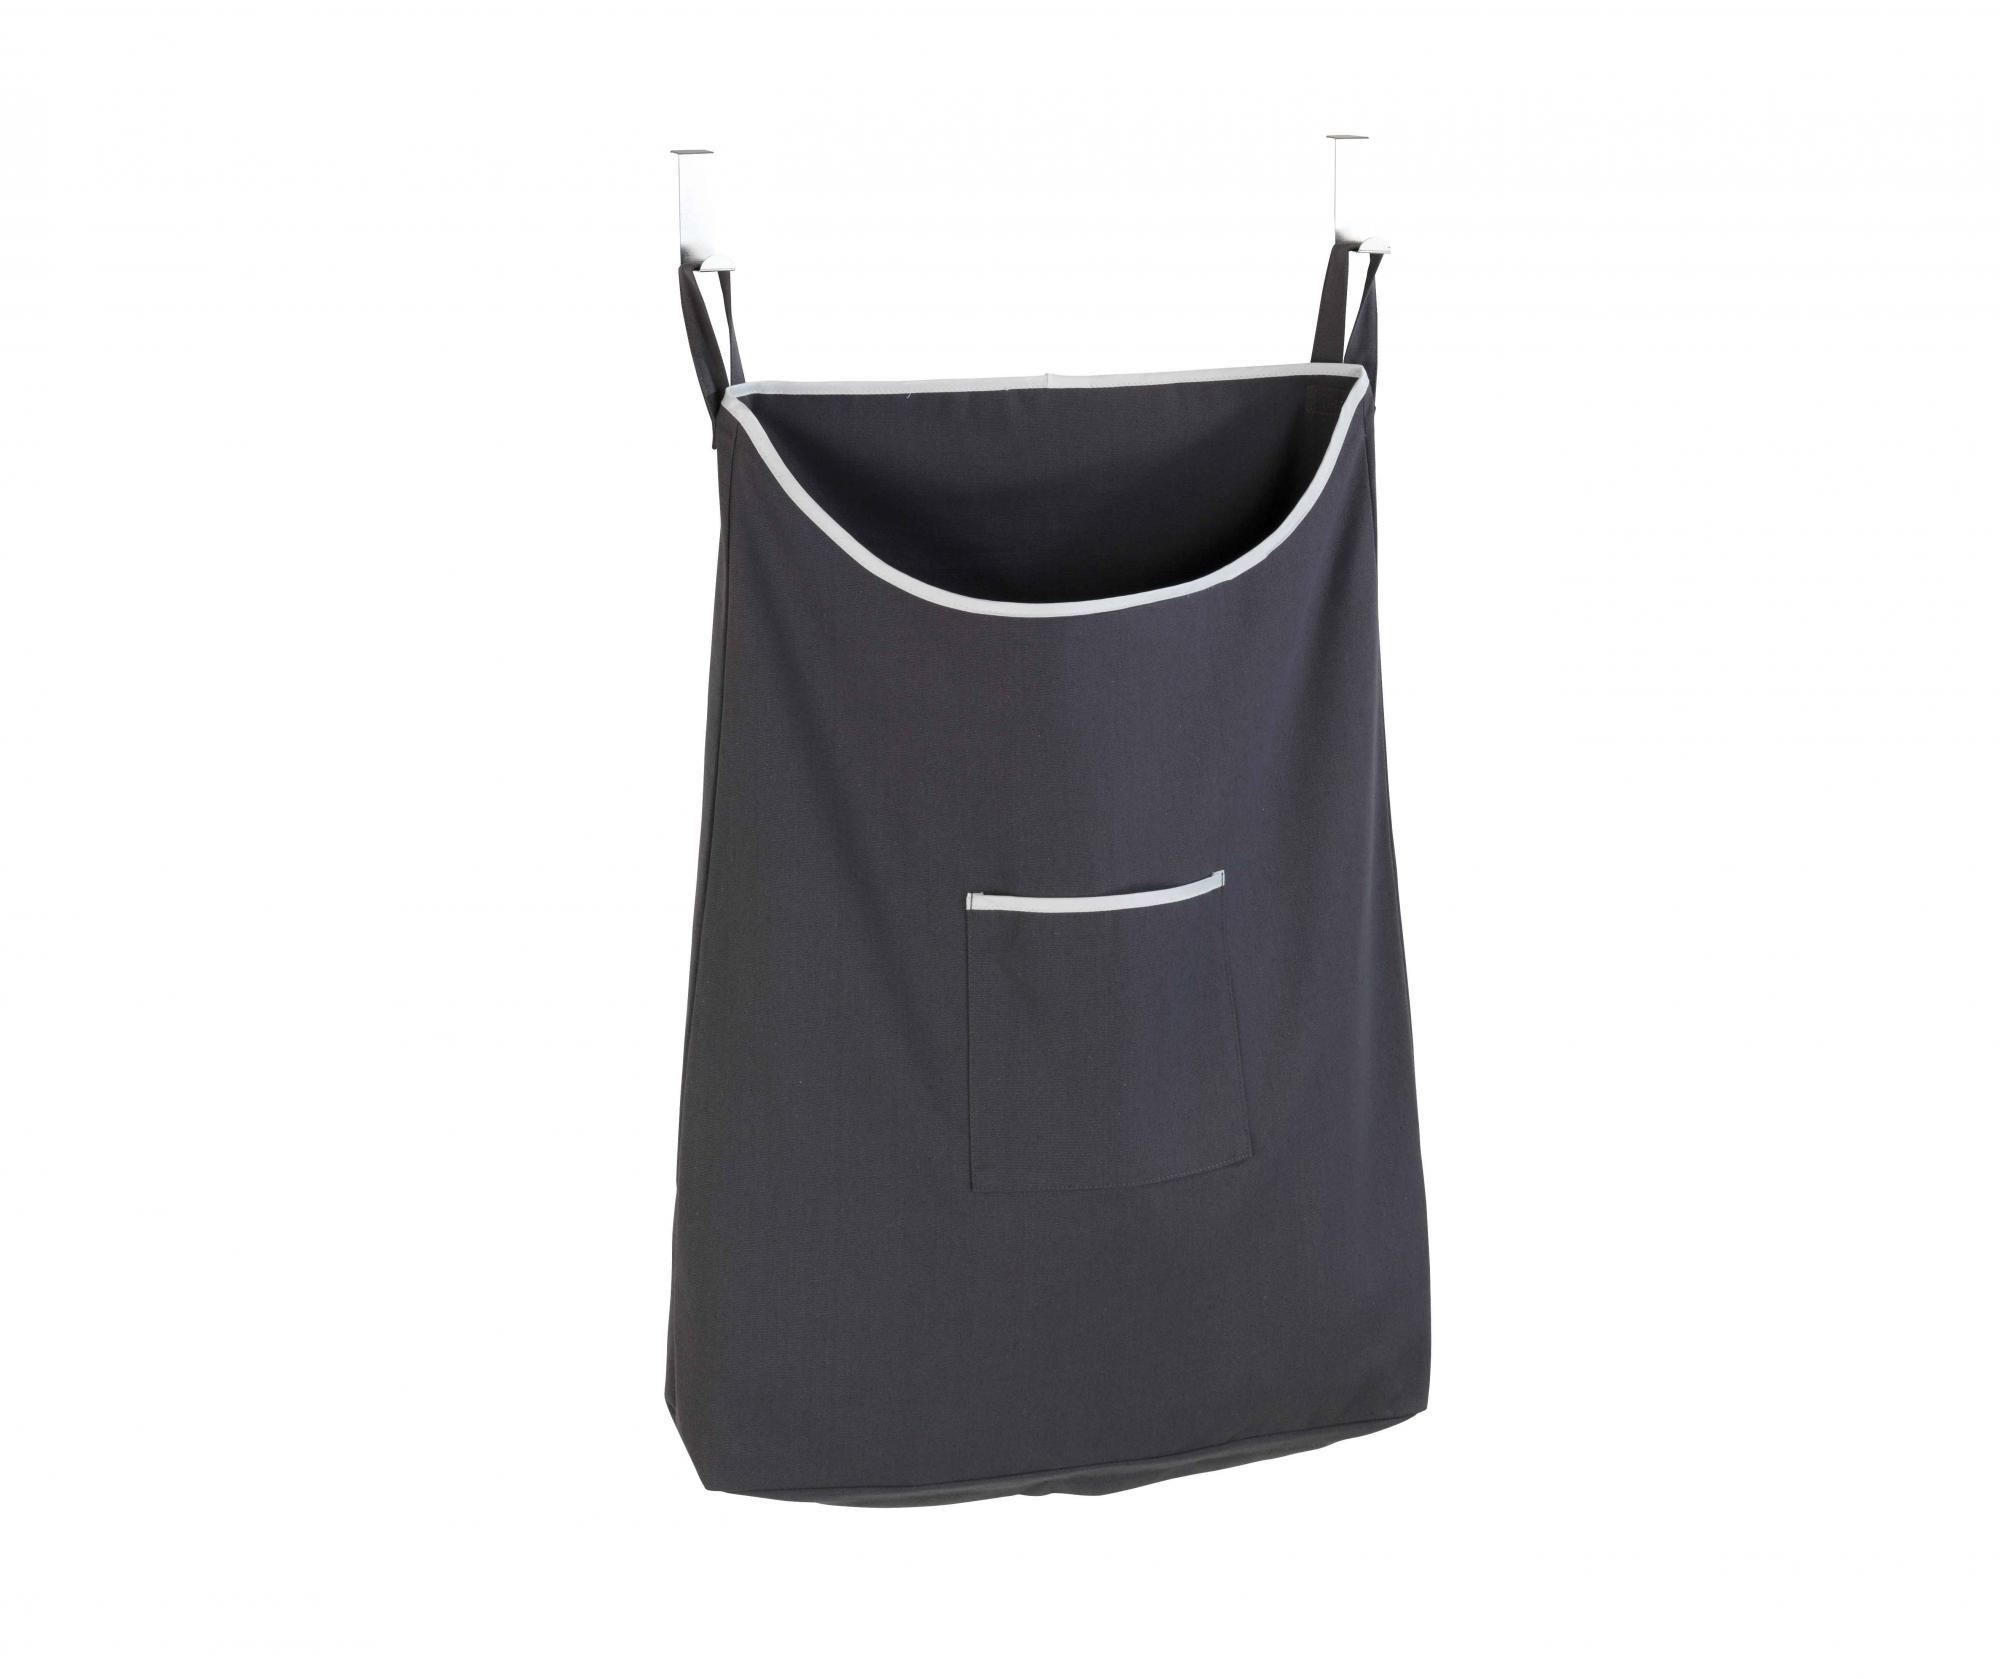 Set 2 cuiere si geanta pentru rufe Canguro Grey 65 L - Wenko, Gri & Argintiu vivre.ro